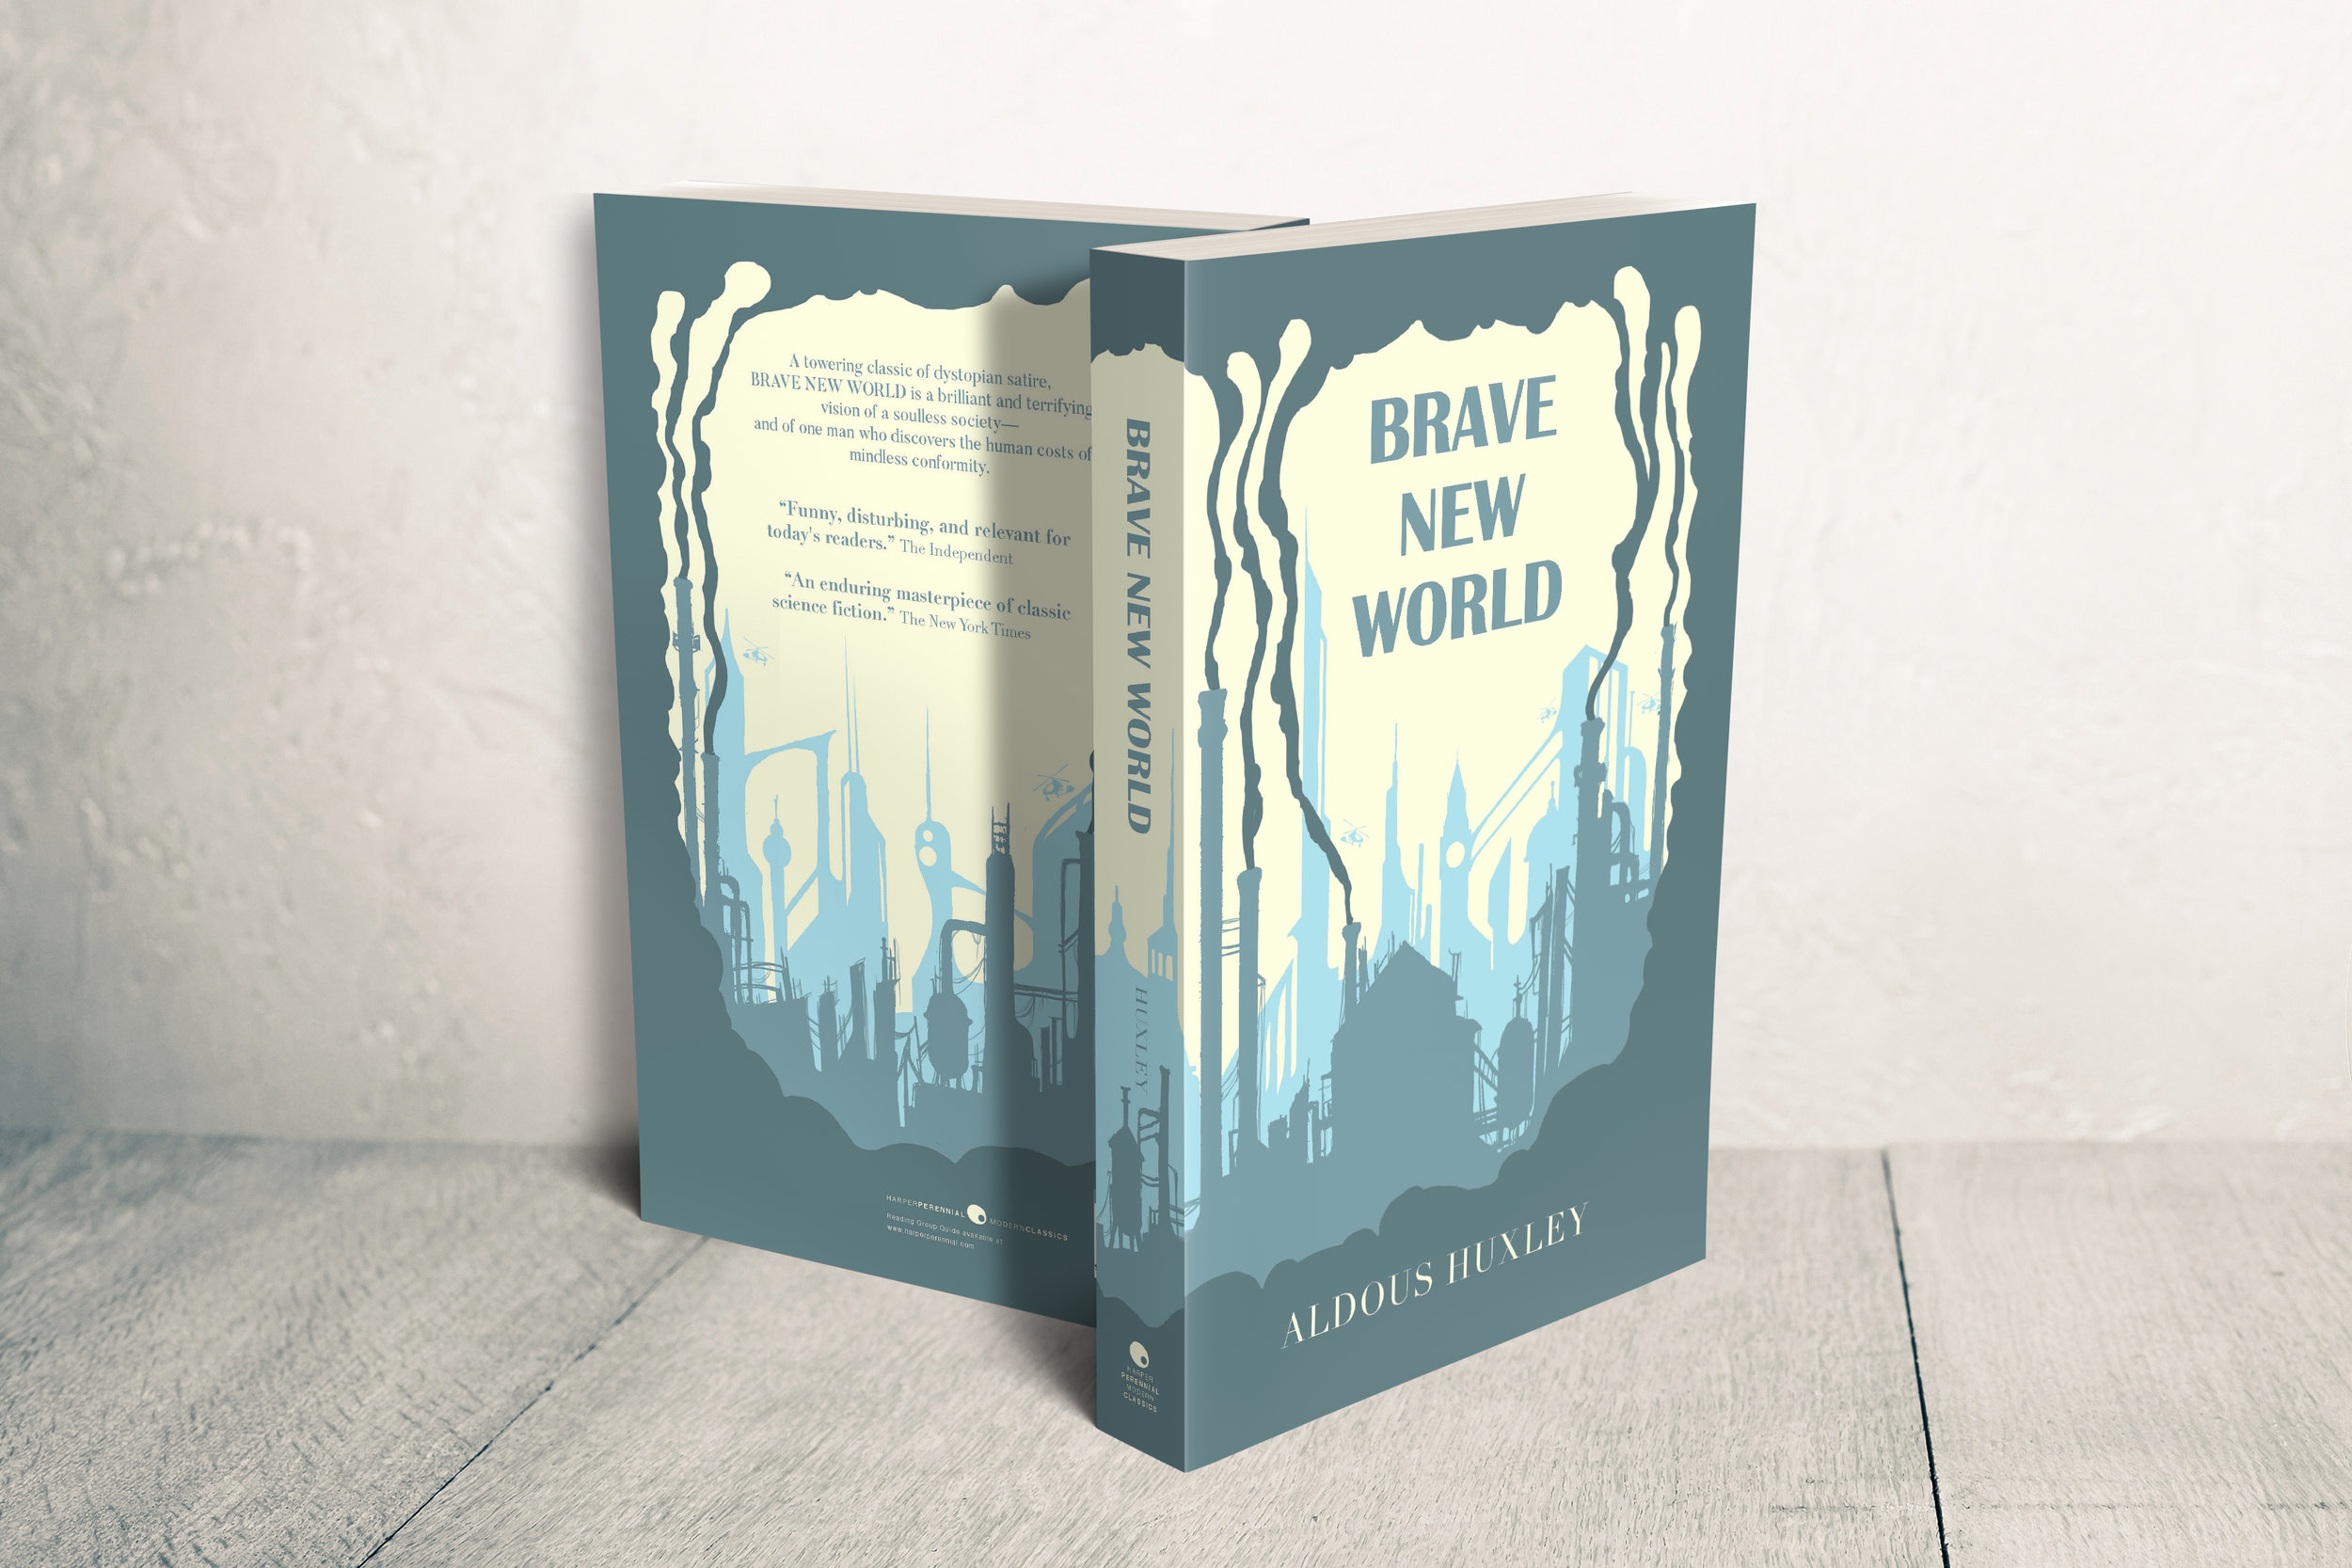 Aldous Huxley's Brave New World jacket